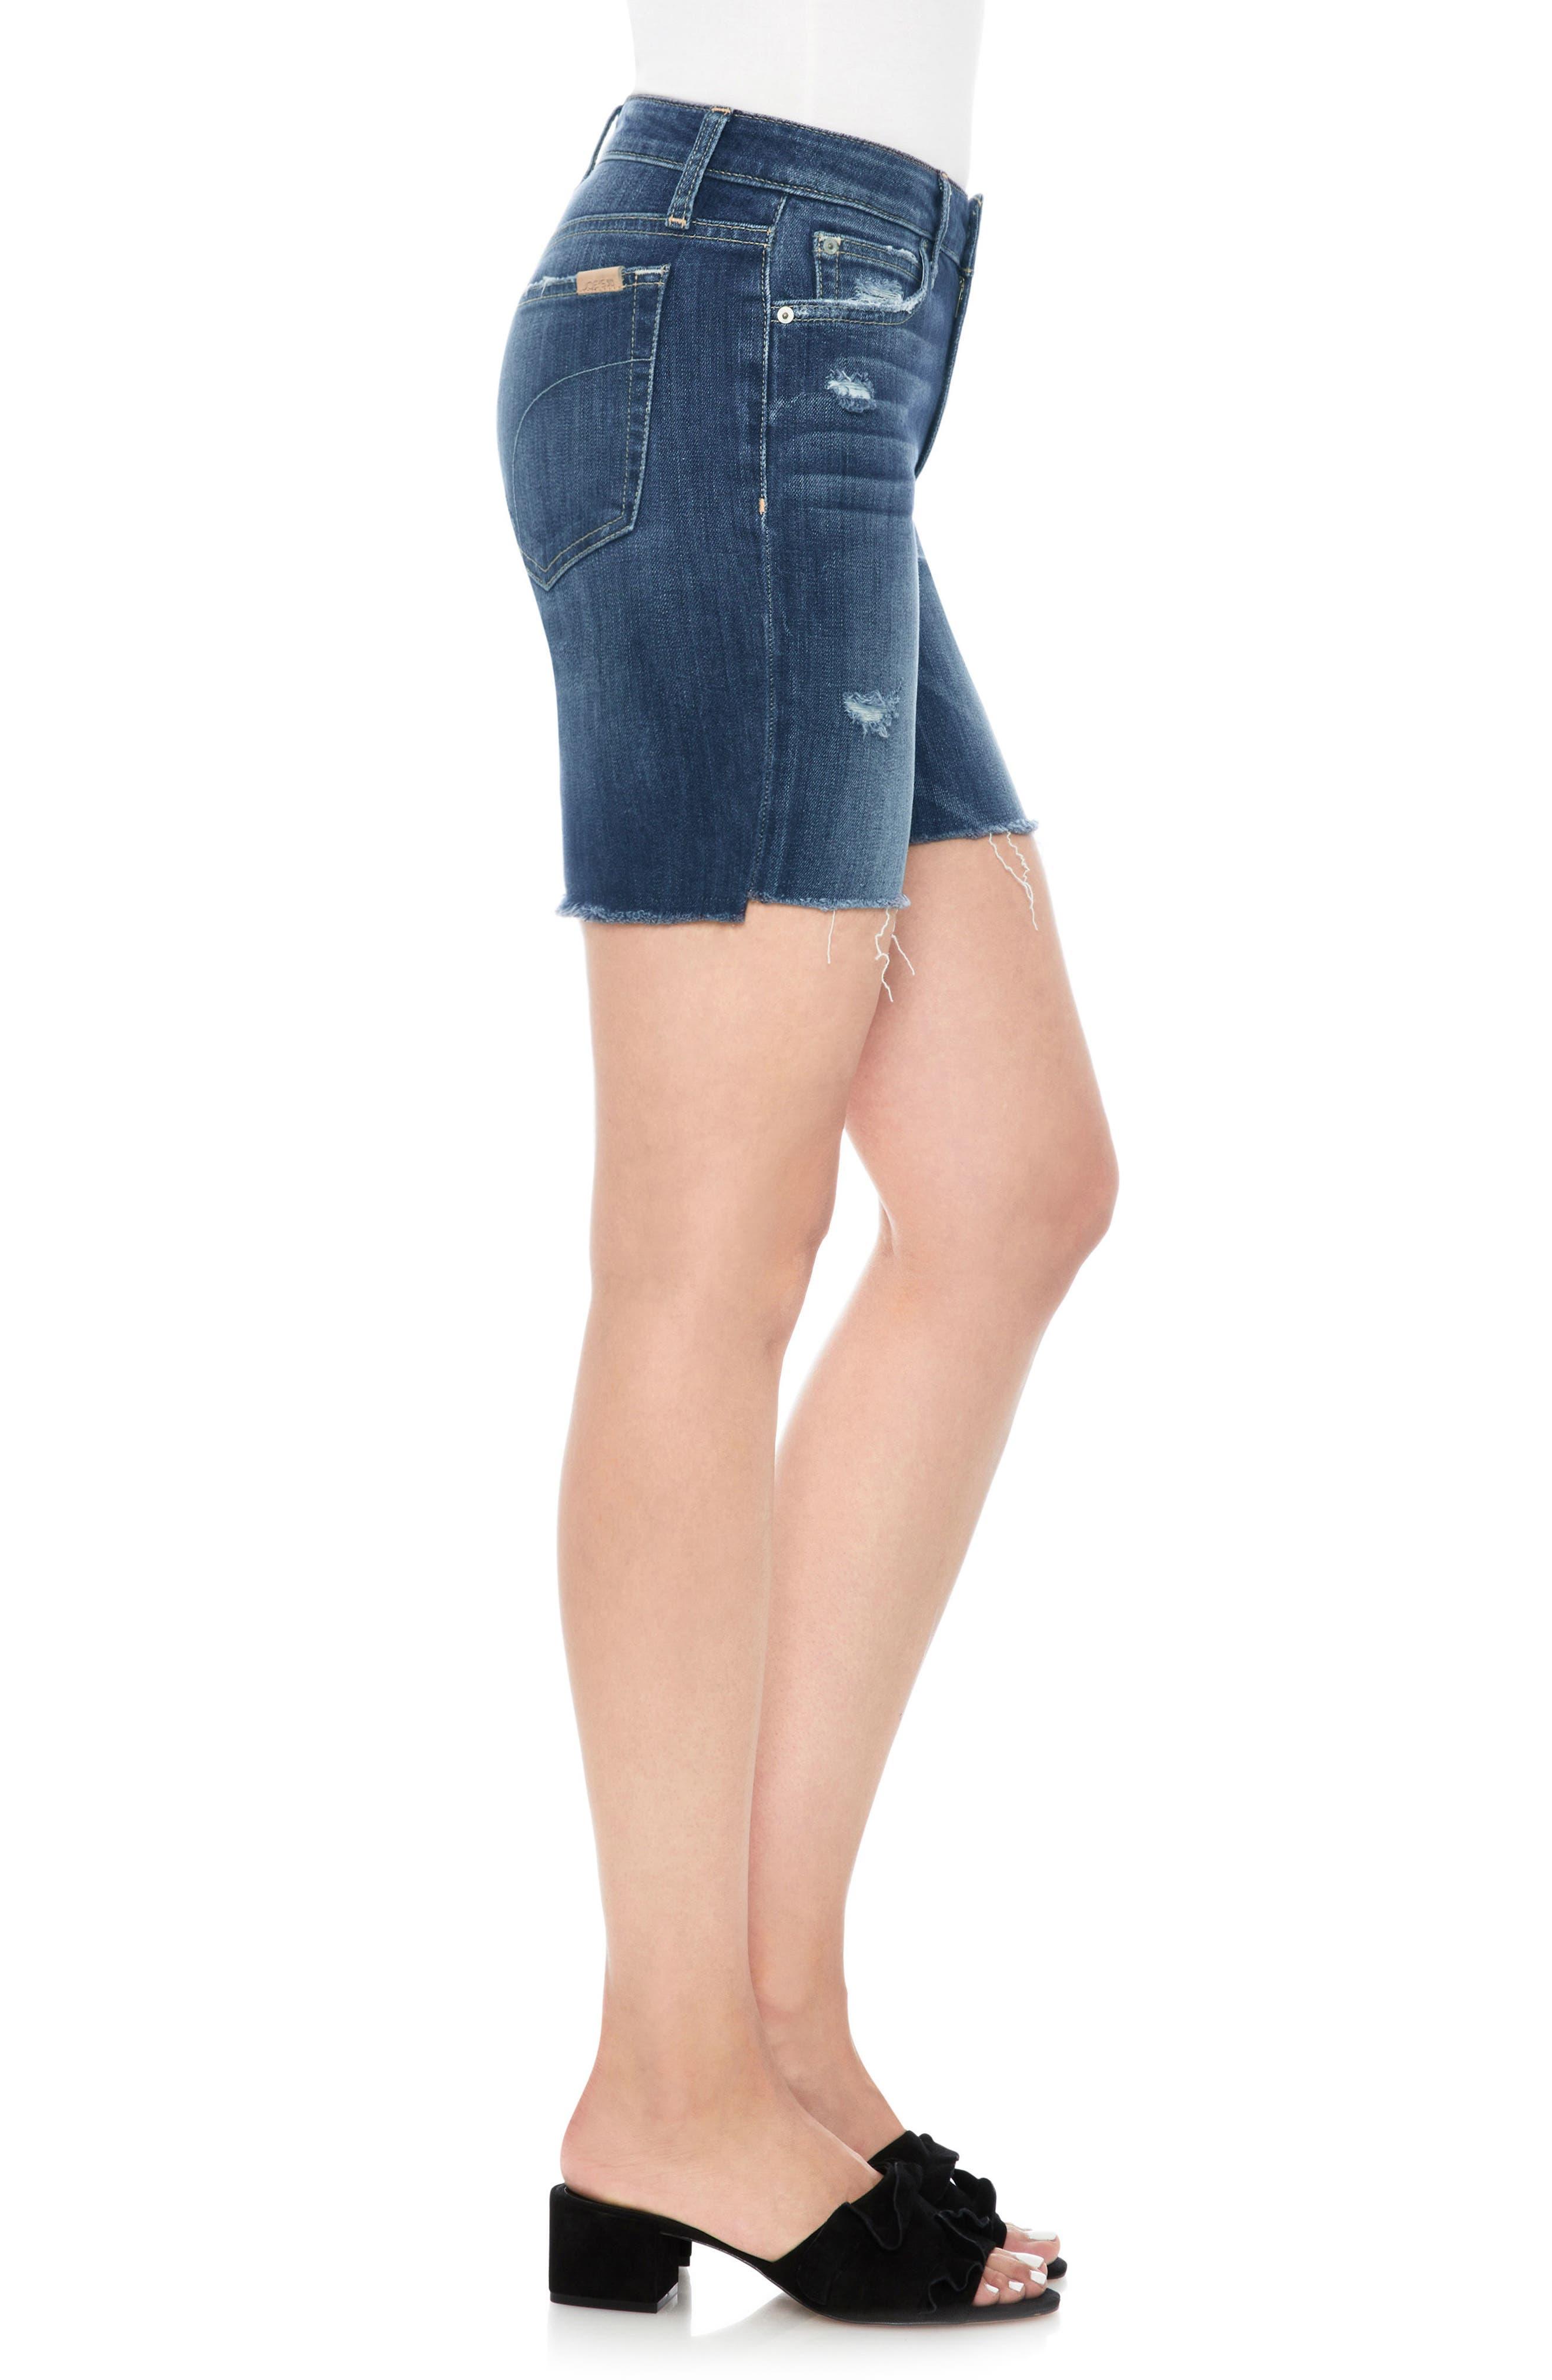 Finn Bermuda Shorts,                             Alternate thumbnail 3, color,                             KARINNE